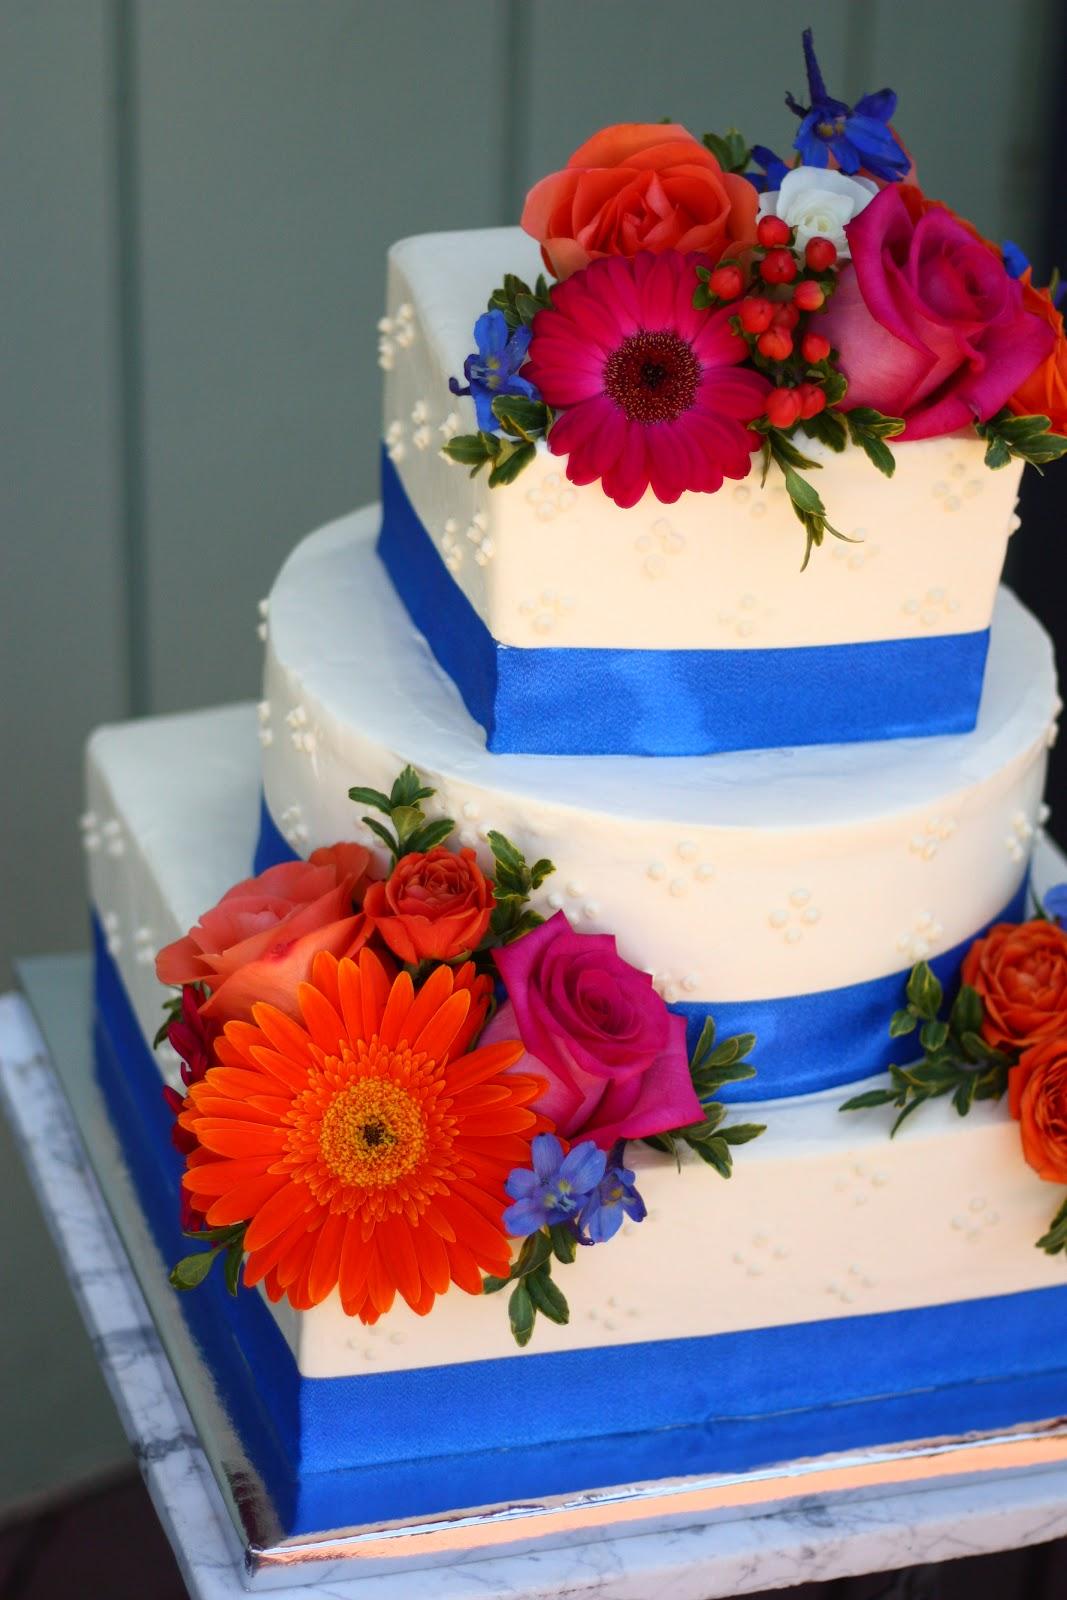 Pie in the Sky: Wedding Cake Roundup